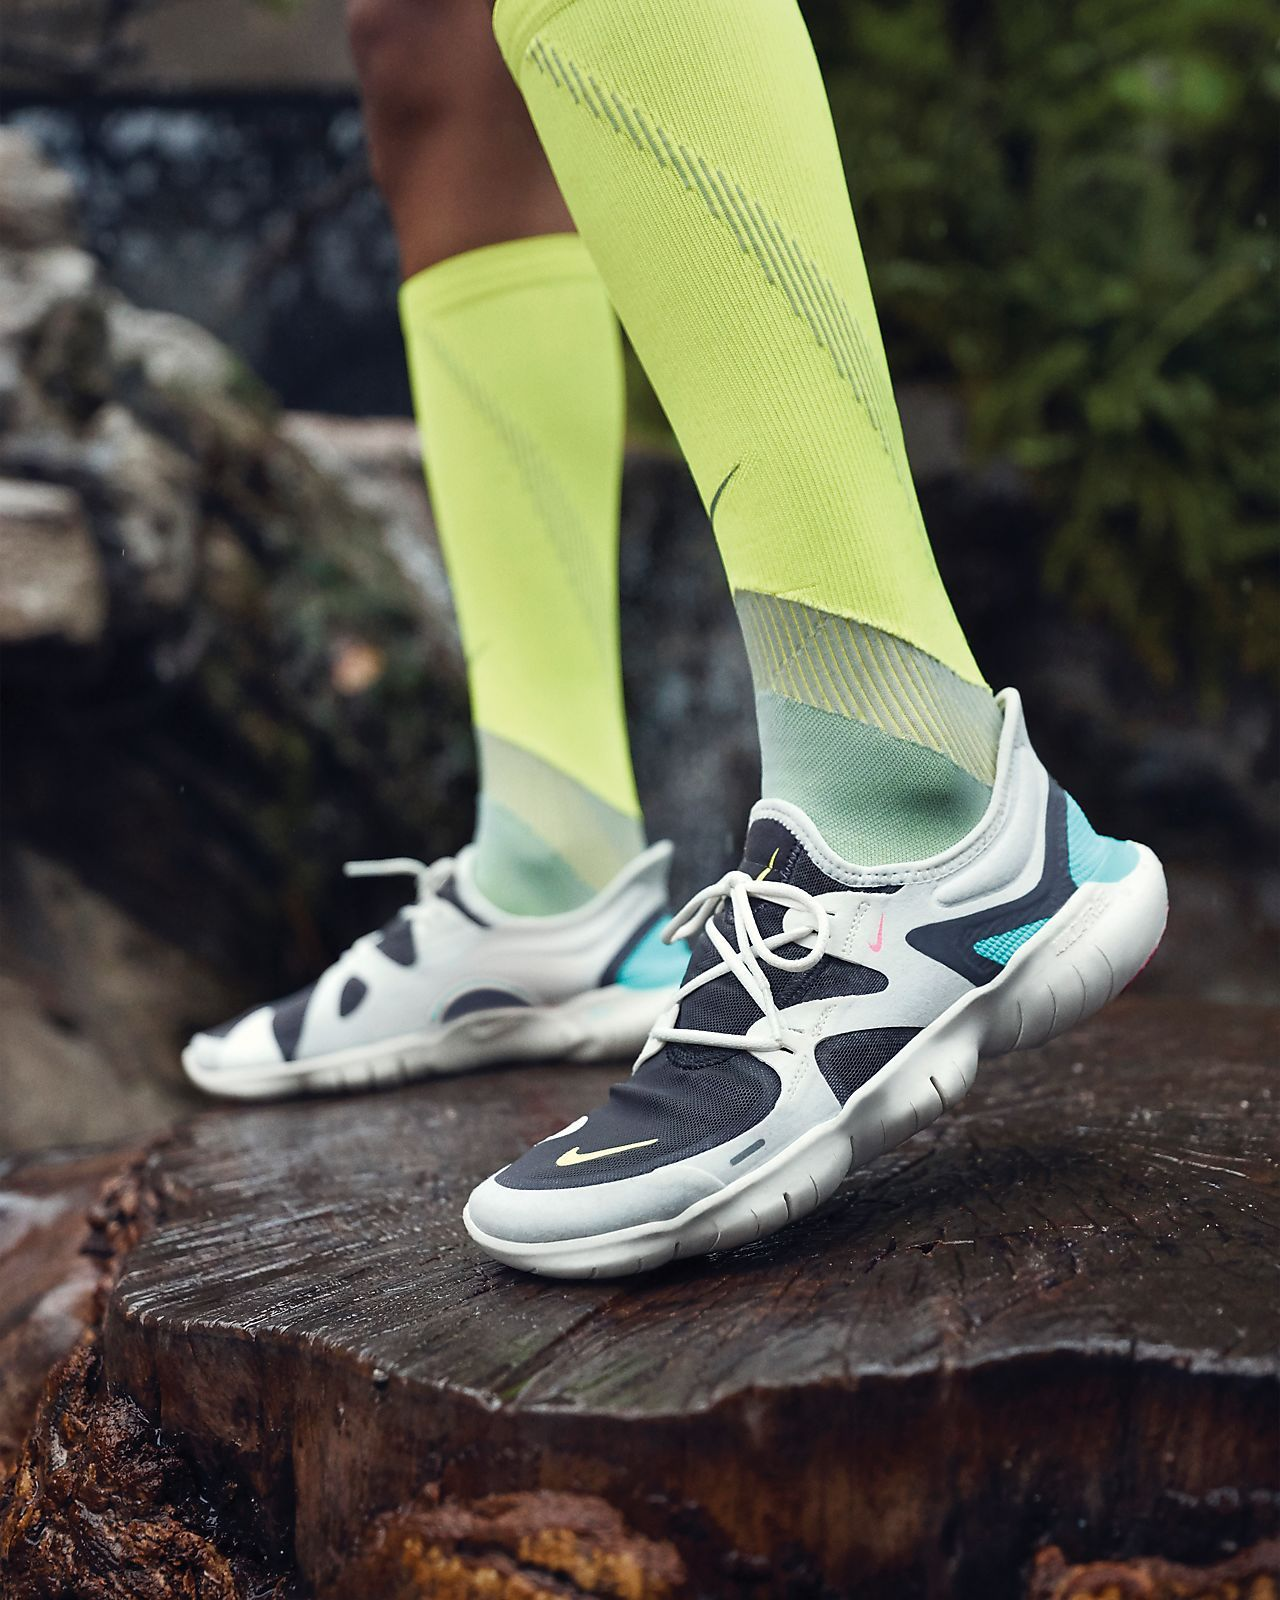 nike 5.0 running shoes womens